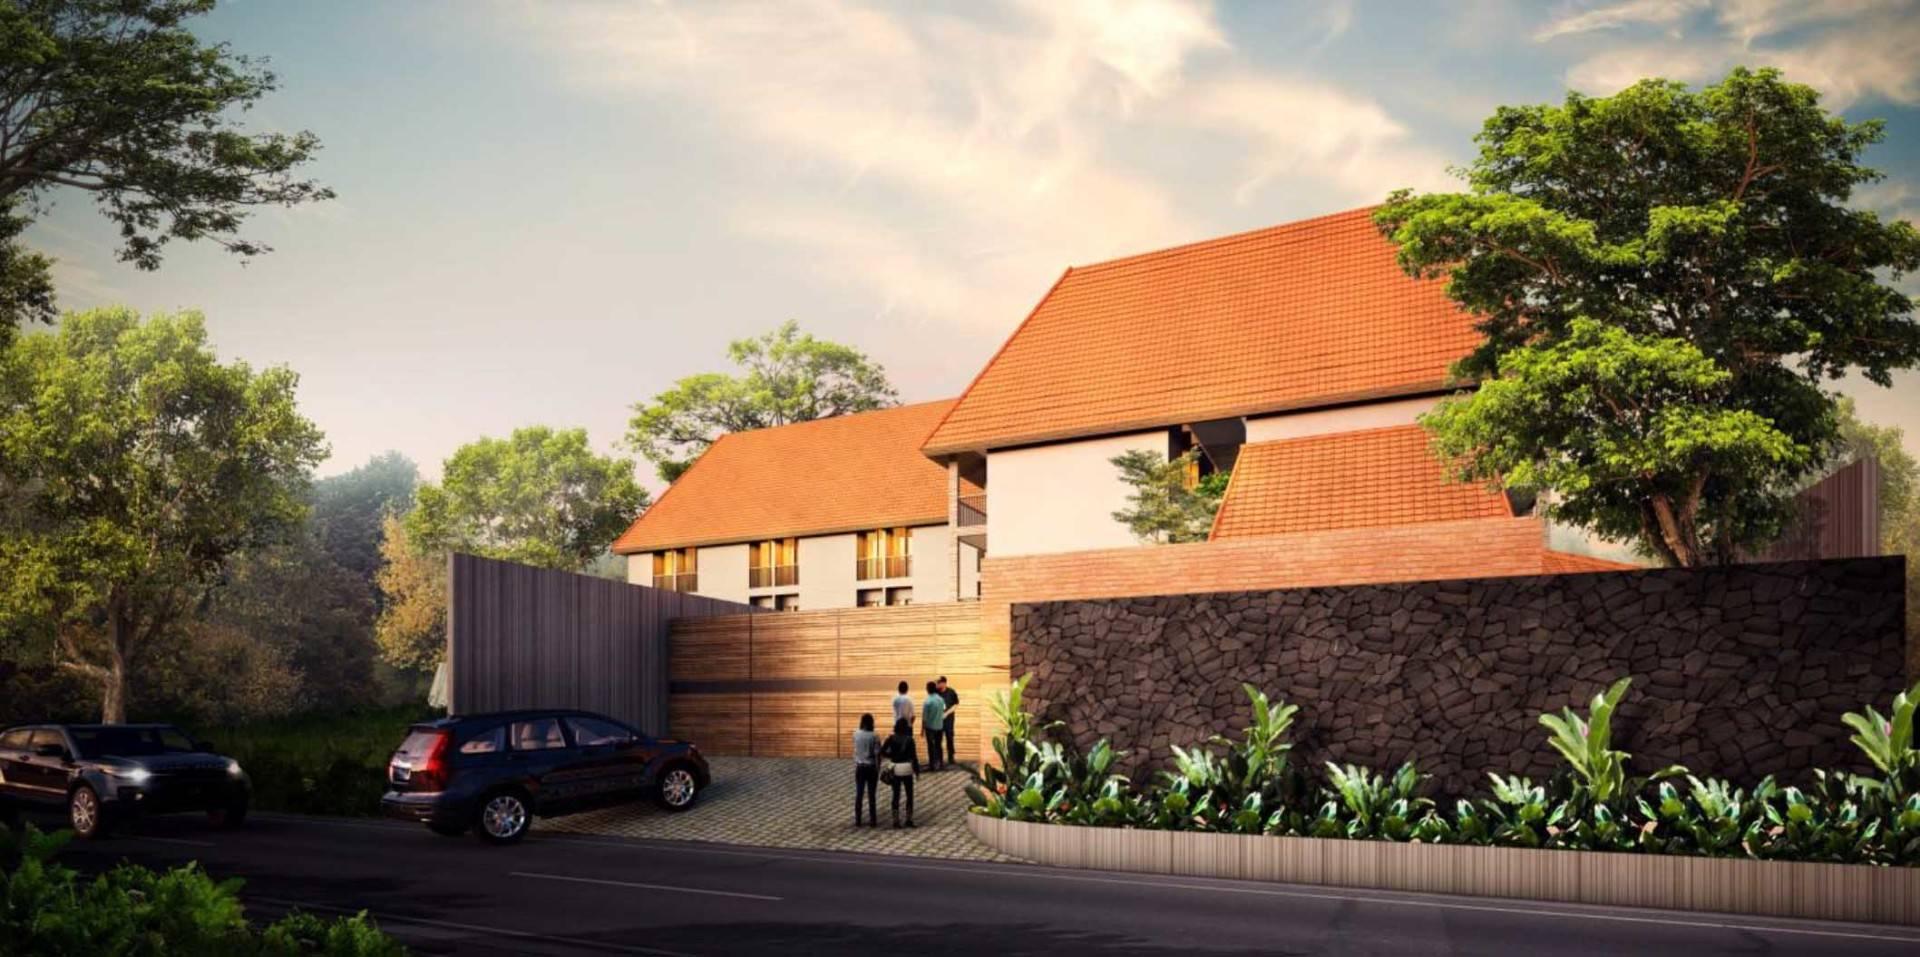 Atelier Prapanca Service Apartment Yogyakarta, Indonesia Yogyakarta, Indonesia Front-View-2 Minimalis  7594